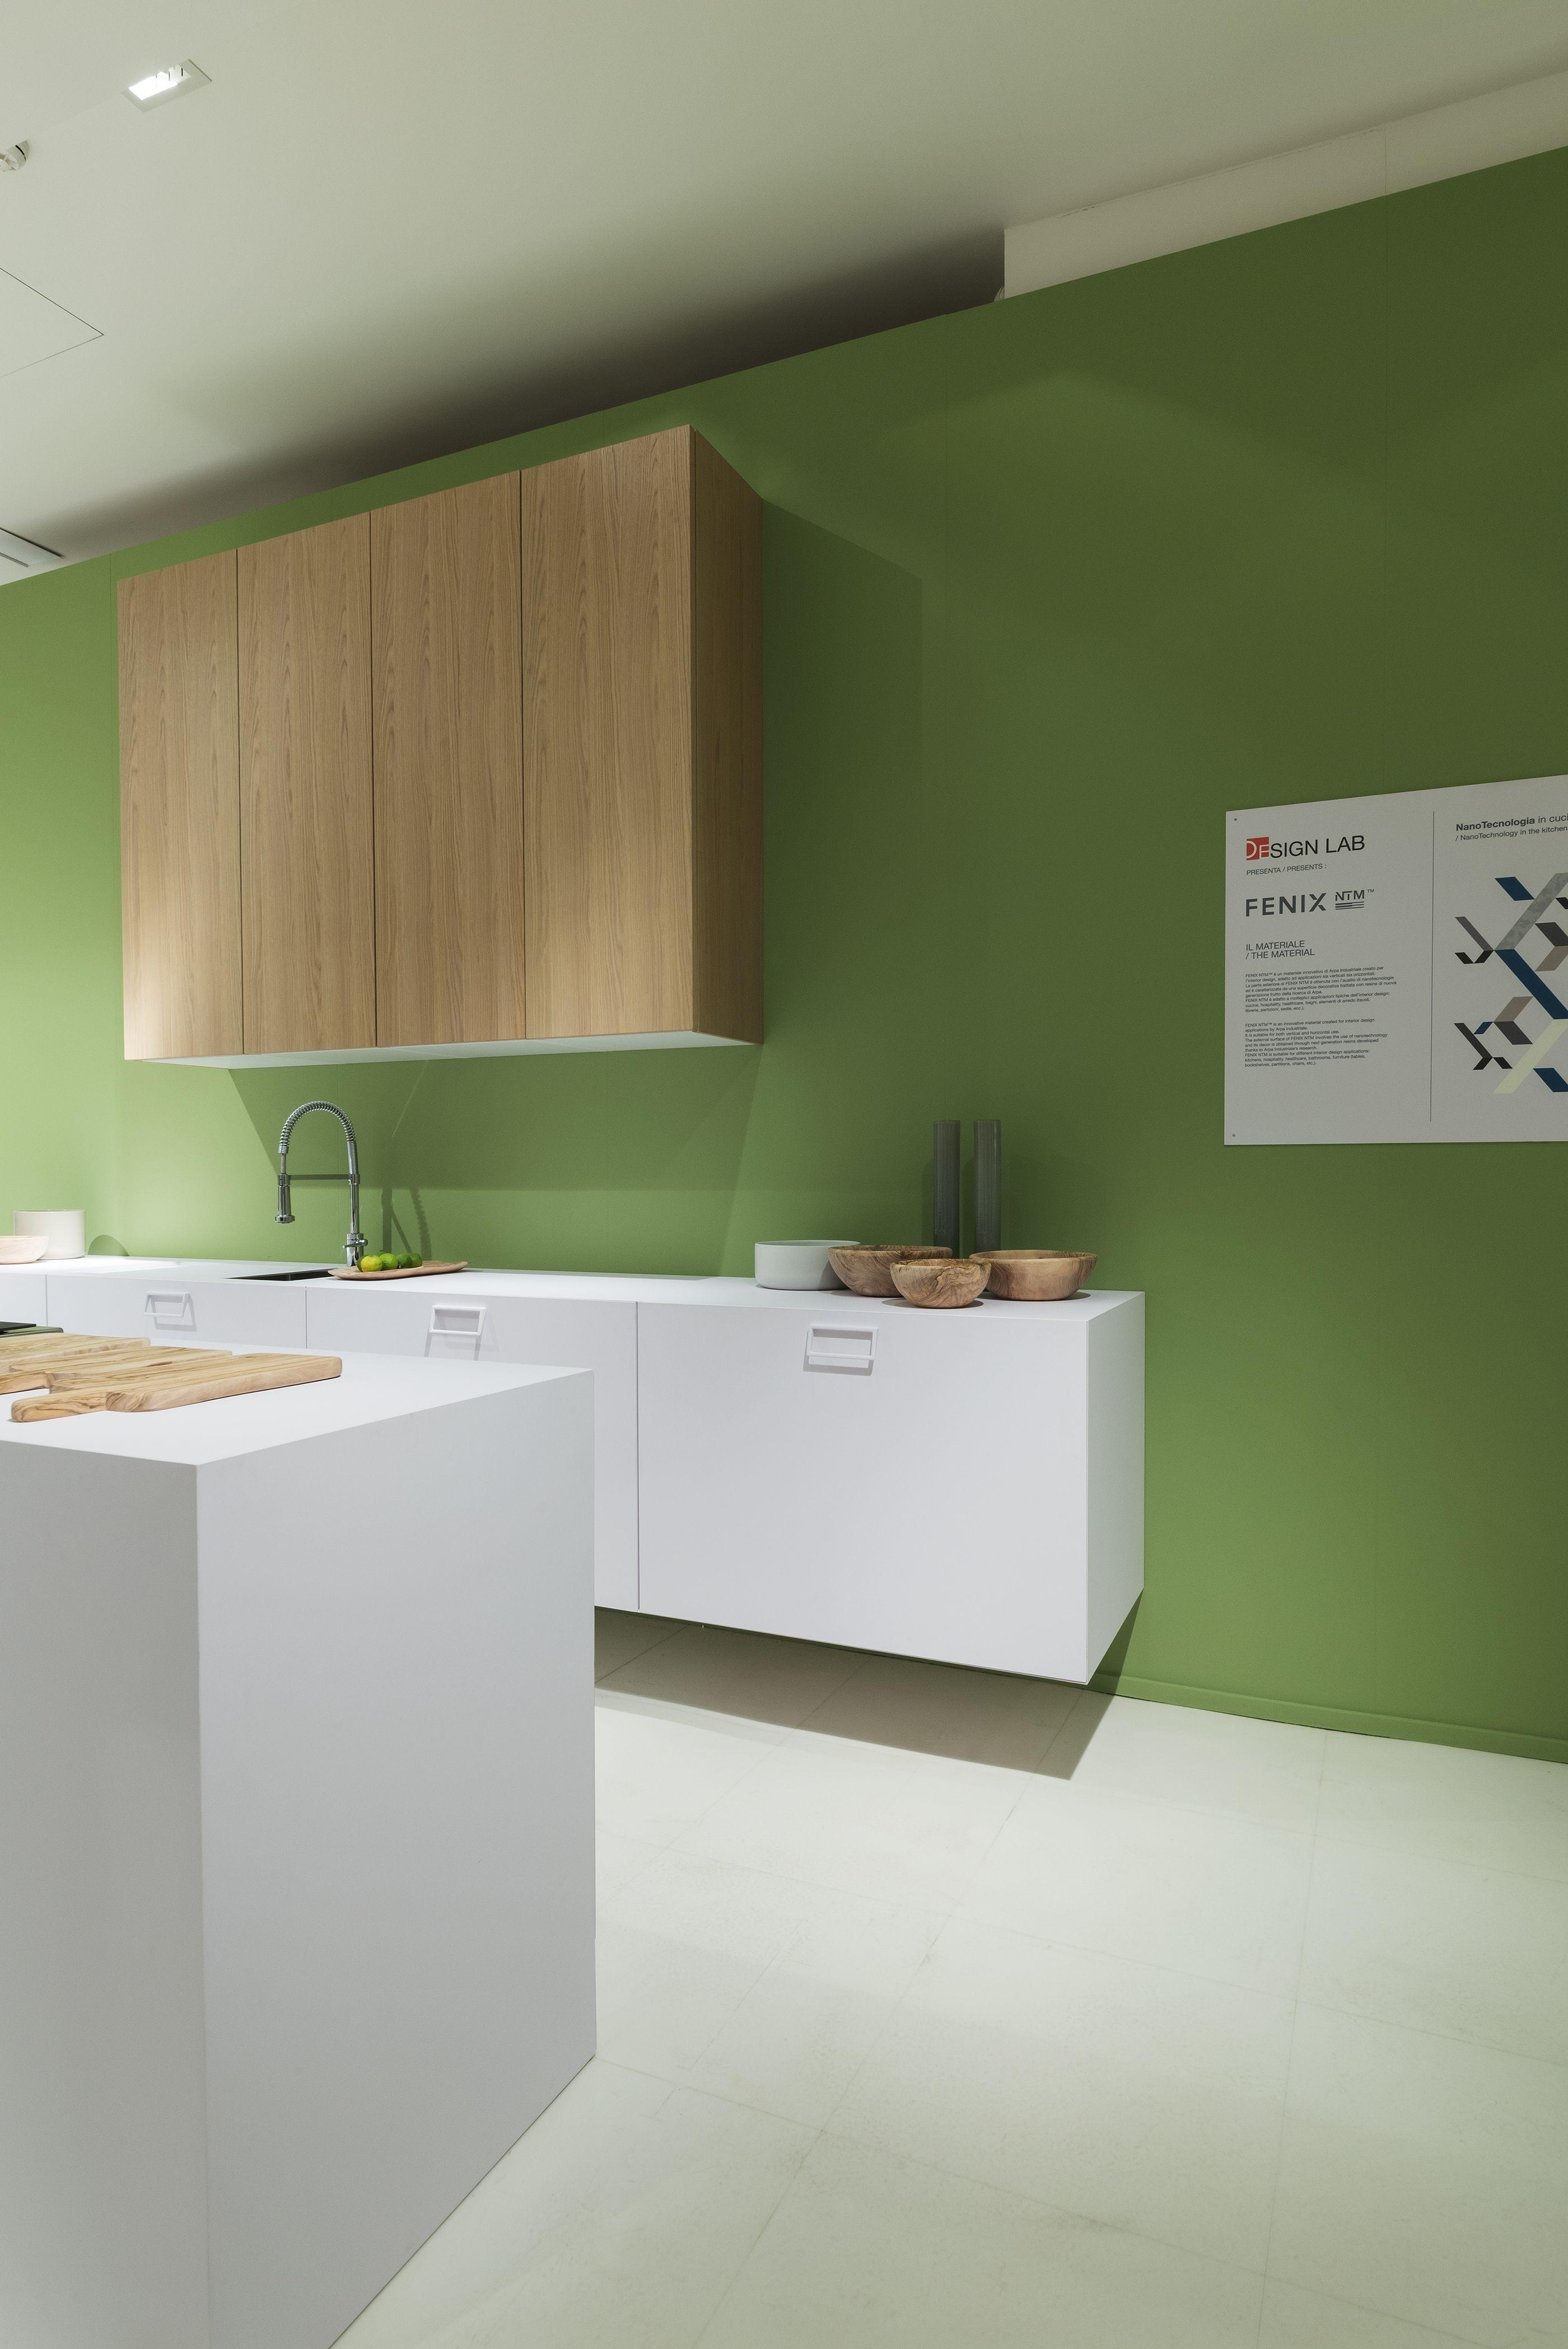 boffi kitchen cabinet madenof white fenix ntm colour bianco kos